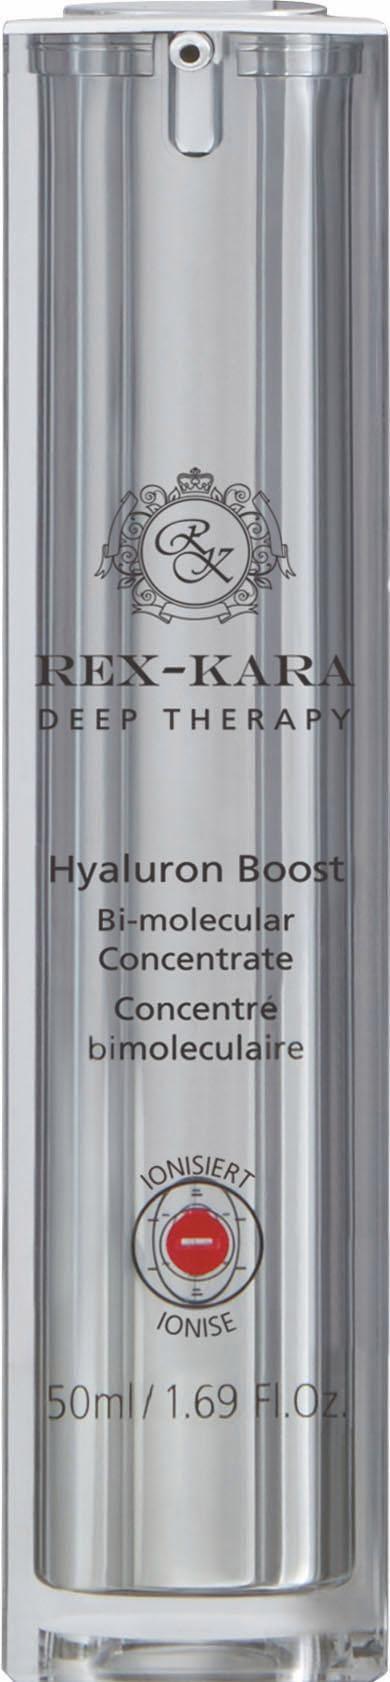 REX-KARA, »Hyaluron Boost Bi-molecular Concentr...